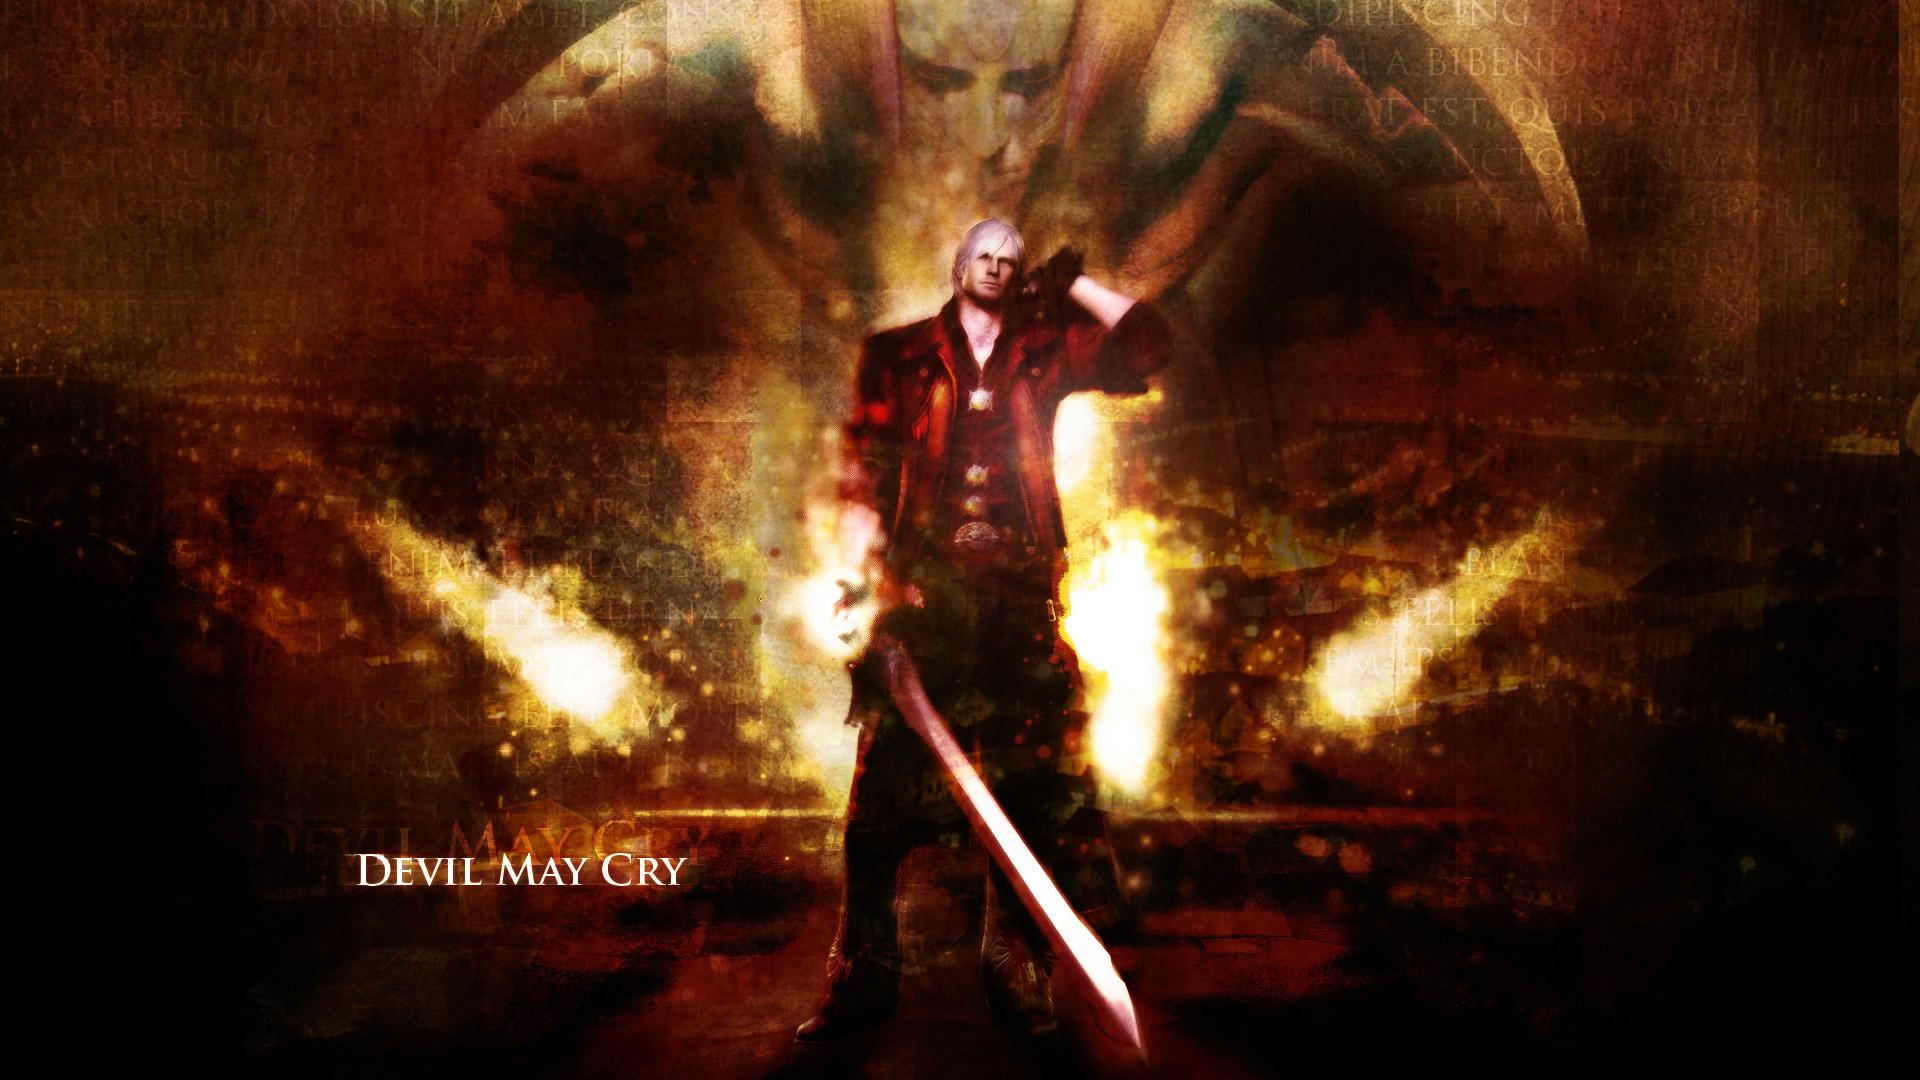 Devil May Cry 4 wallpaper 12